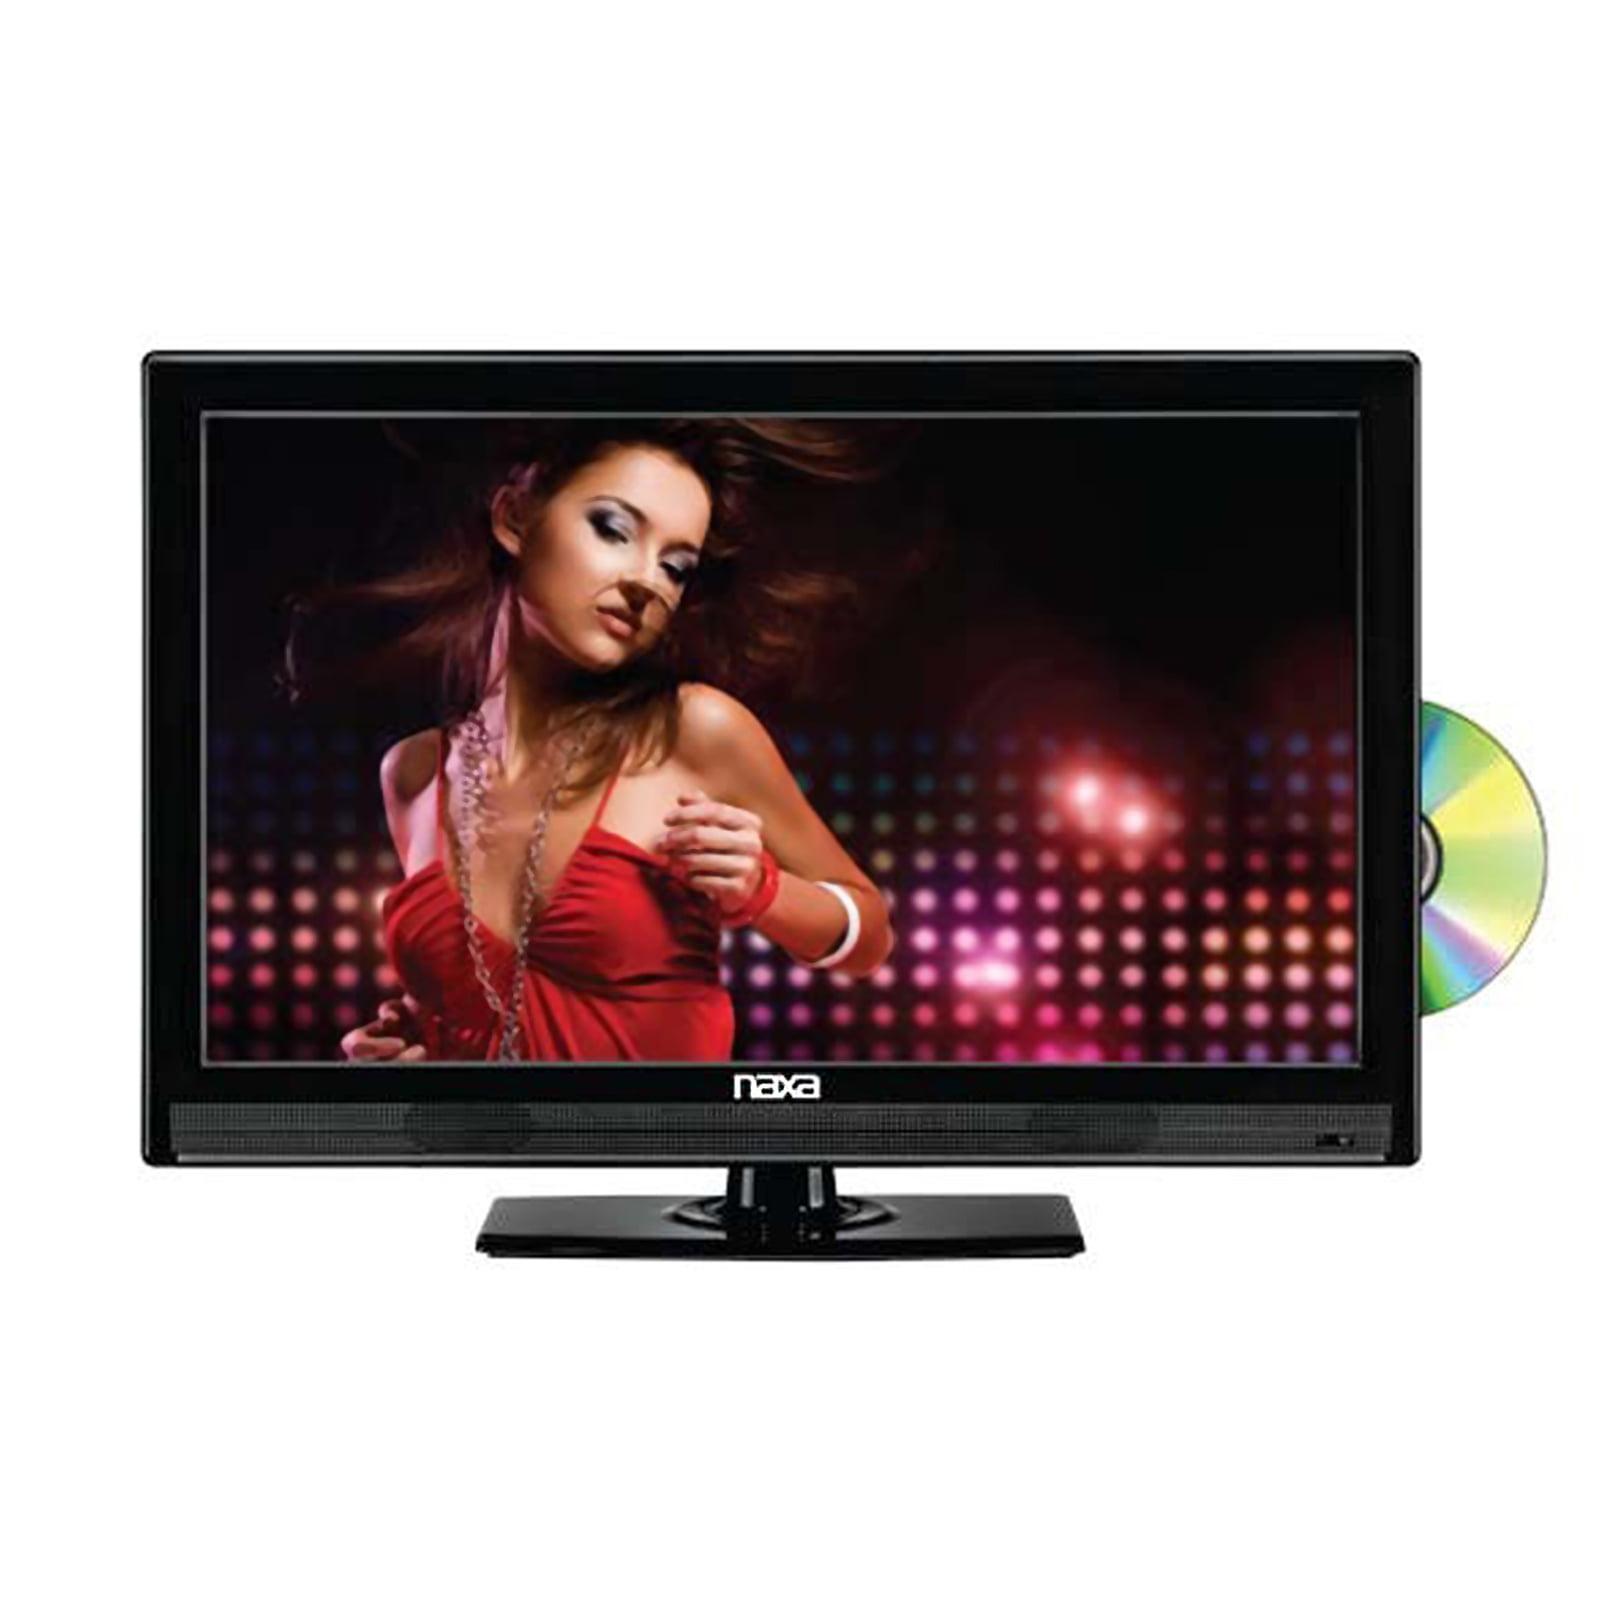 "Naxa 22"" Widescreen HD LED TV"